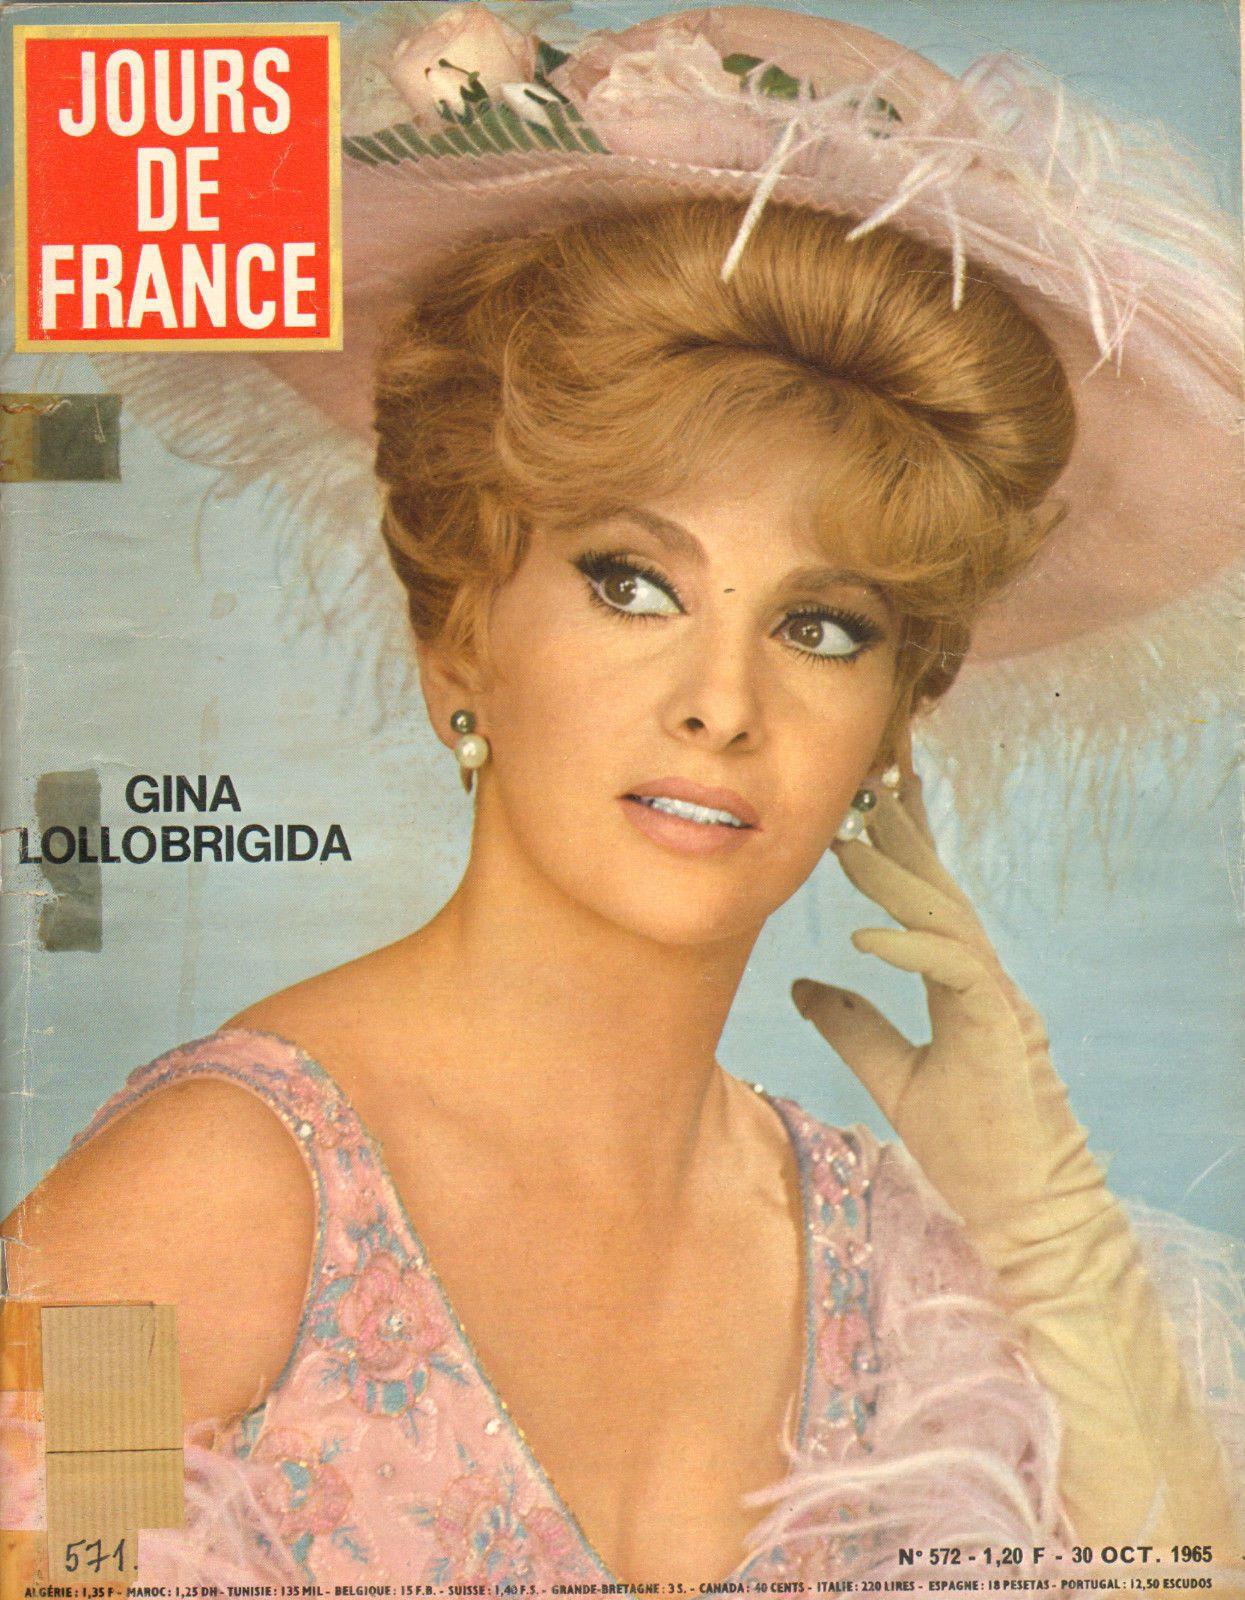 Jours DE France N°572 Gina Lollobrigida Sophie Agacinski Martine Geudt Zizi Romy | eBay